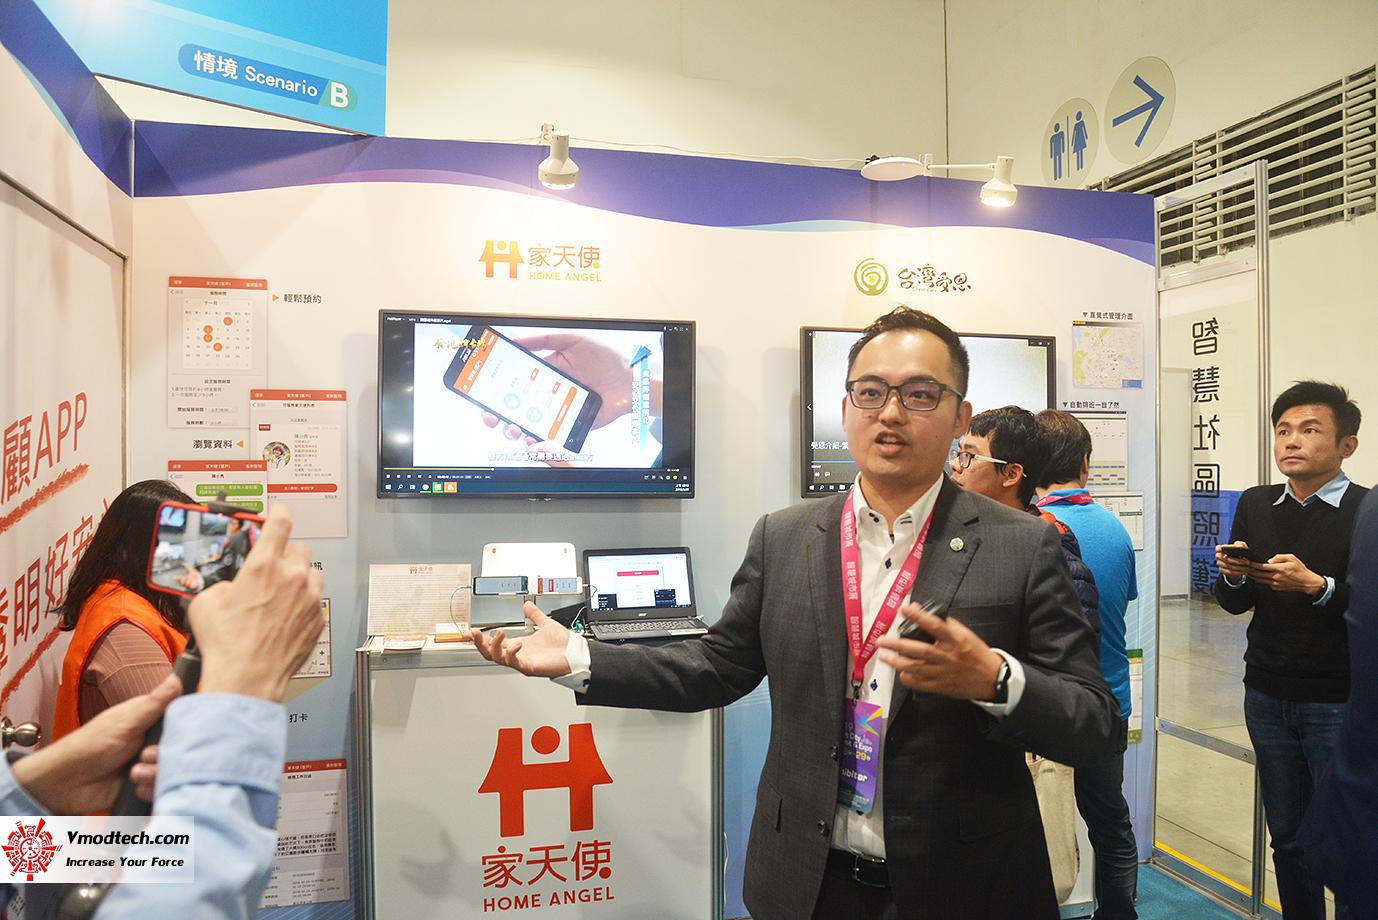 dsc 8747 เยี่ยมชมบูธ Smart Healthcare Expo กับเทคโนโลยีระบบการแพทย์และการดูแลสุขภาพอัจฉริยะในงาน 2019 SMART CITY SUMMIT & EXPO ณ กรุงไทเป ประเทศไต้หวัน